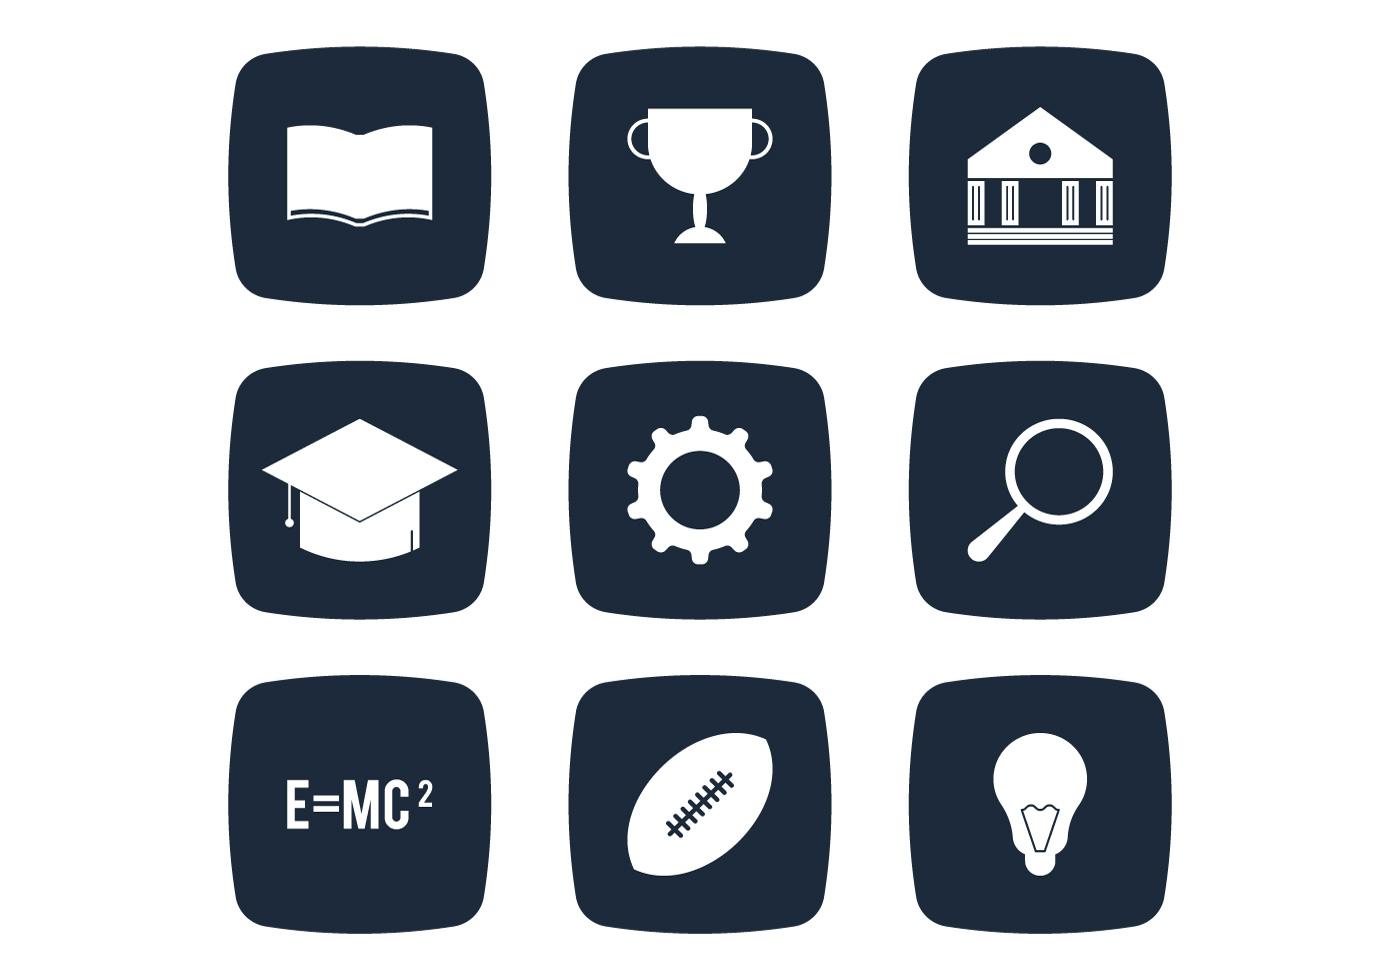 University Simple Icon - Download Free Vector Art, Stock Graphics